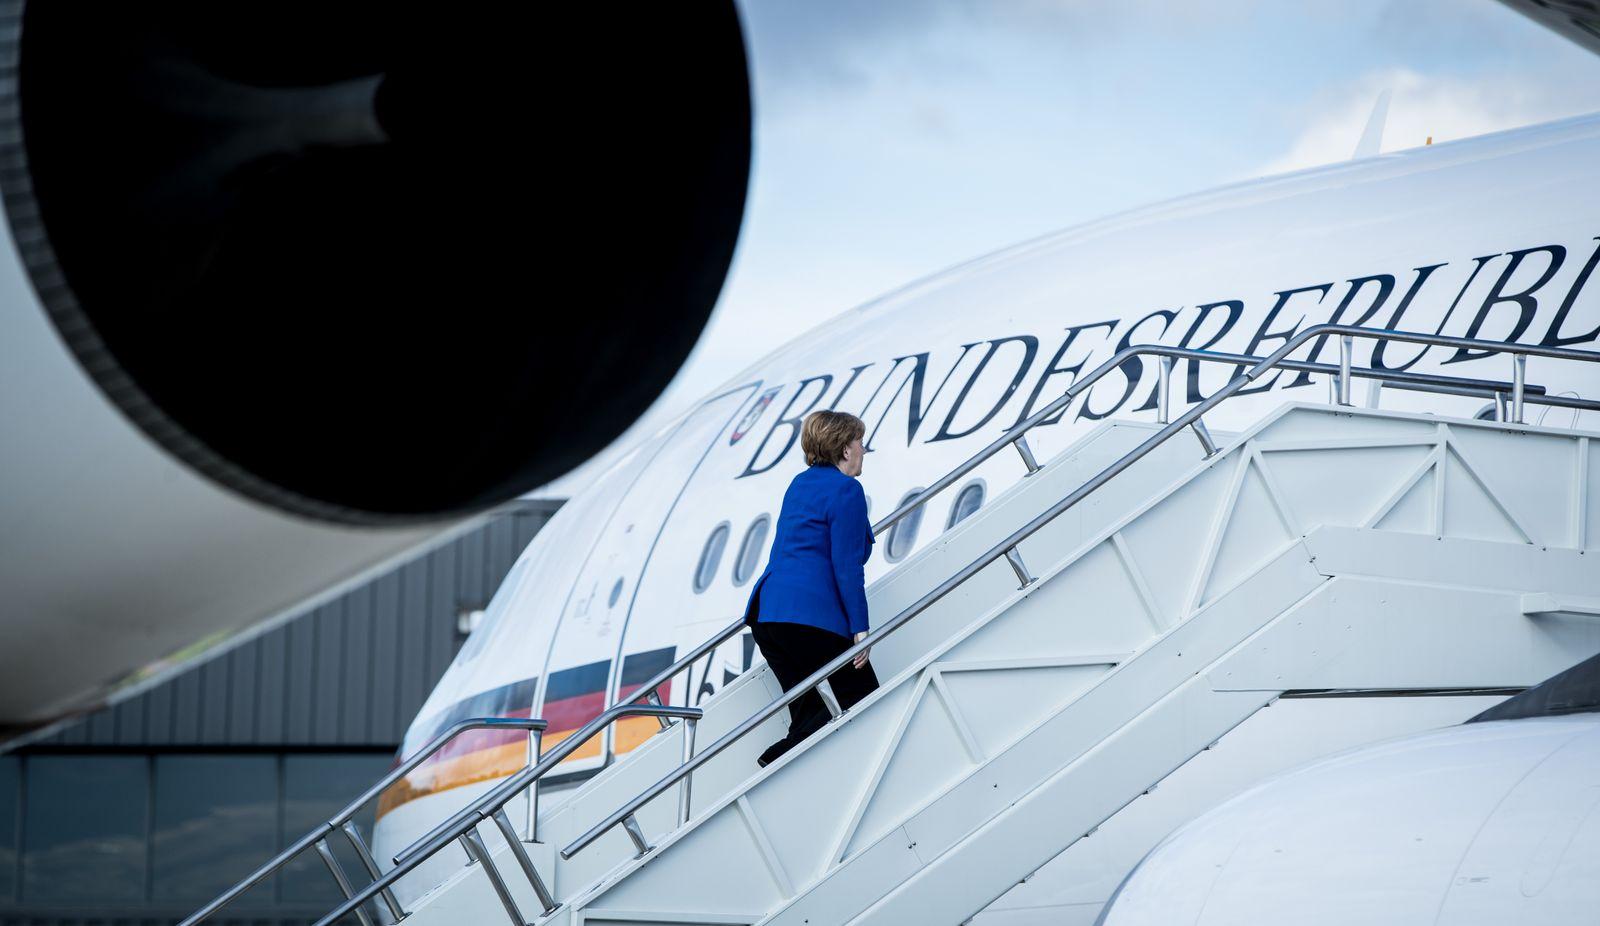 PLUS - SP 23/2018 S.28 Weltbild Angela Merkel